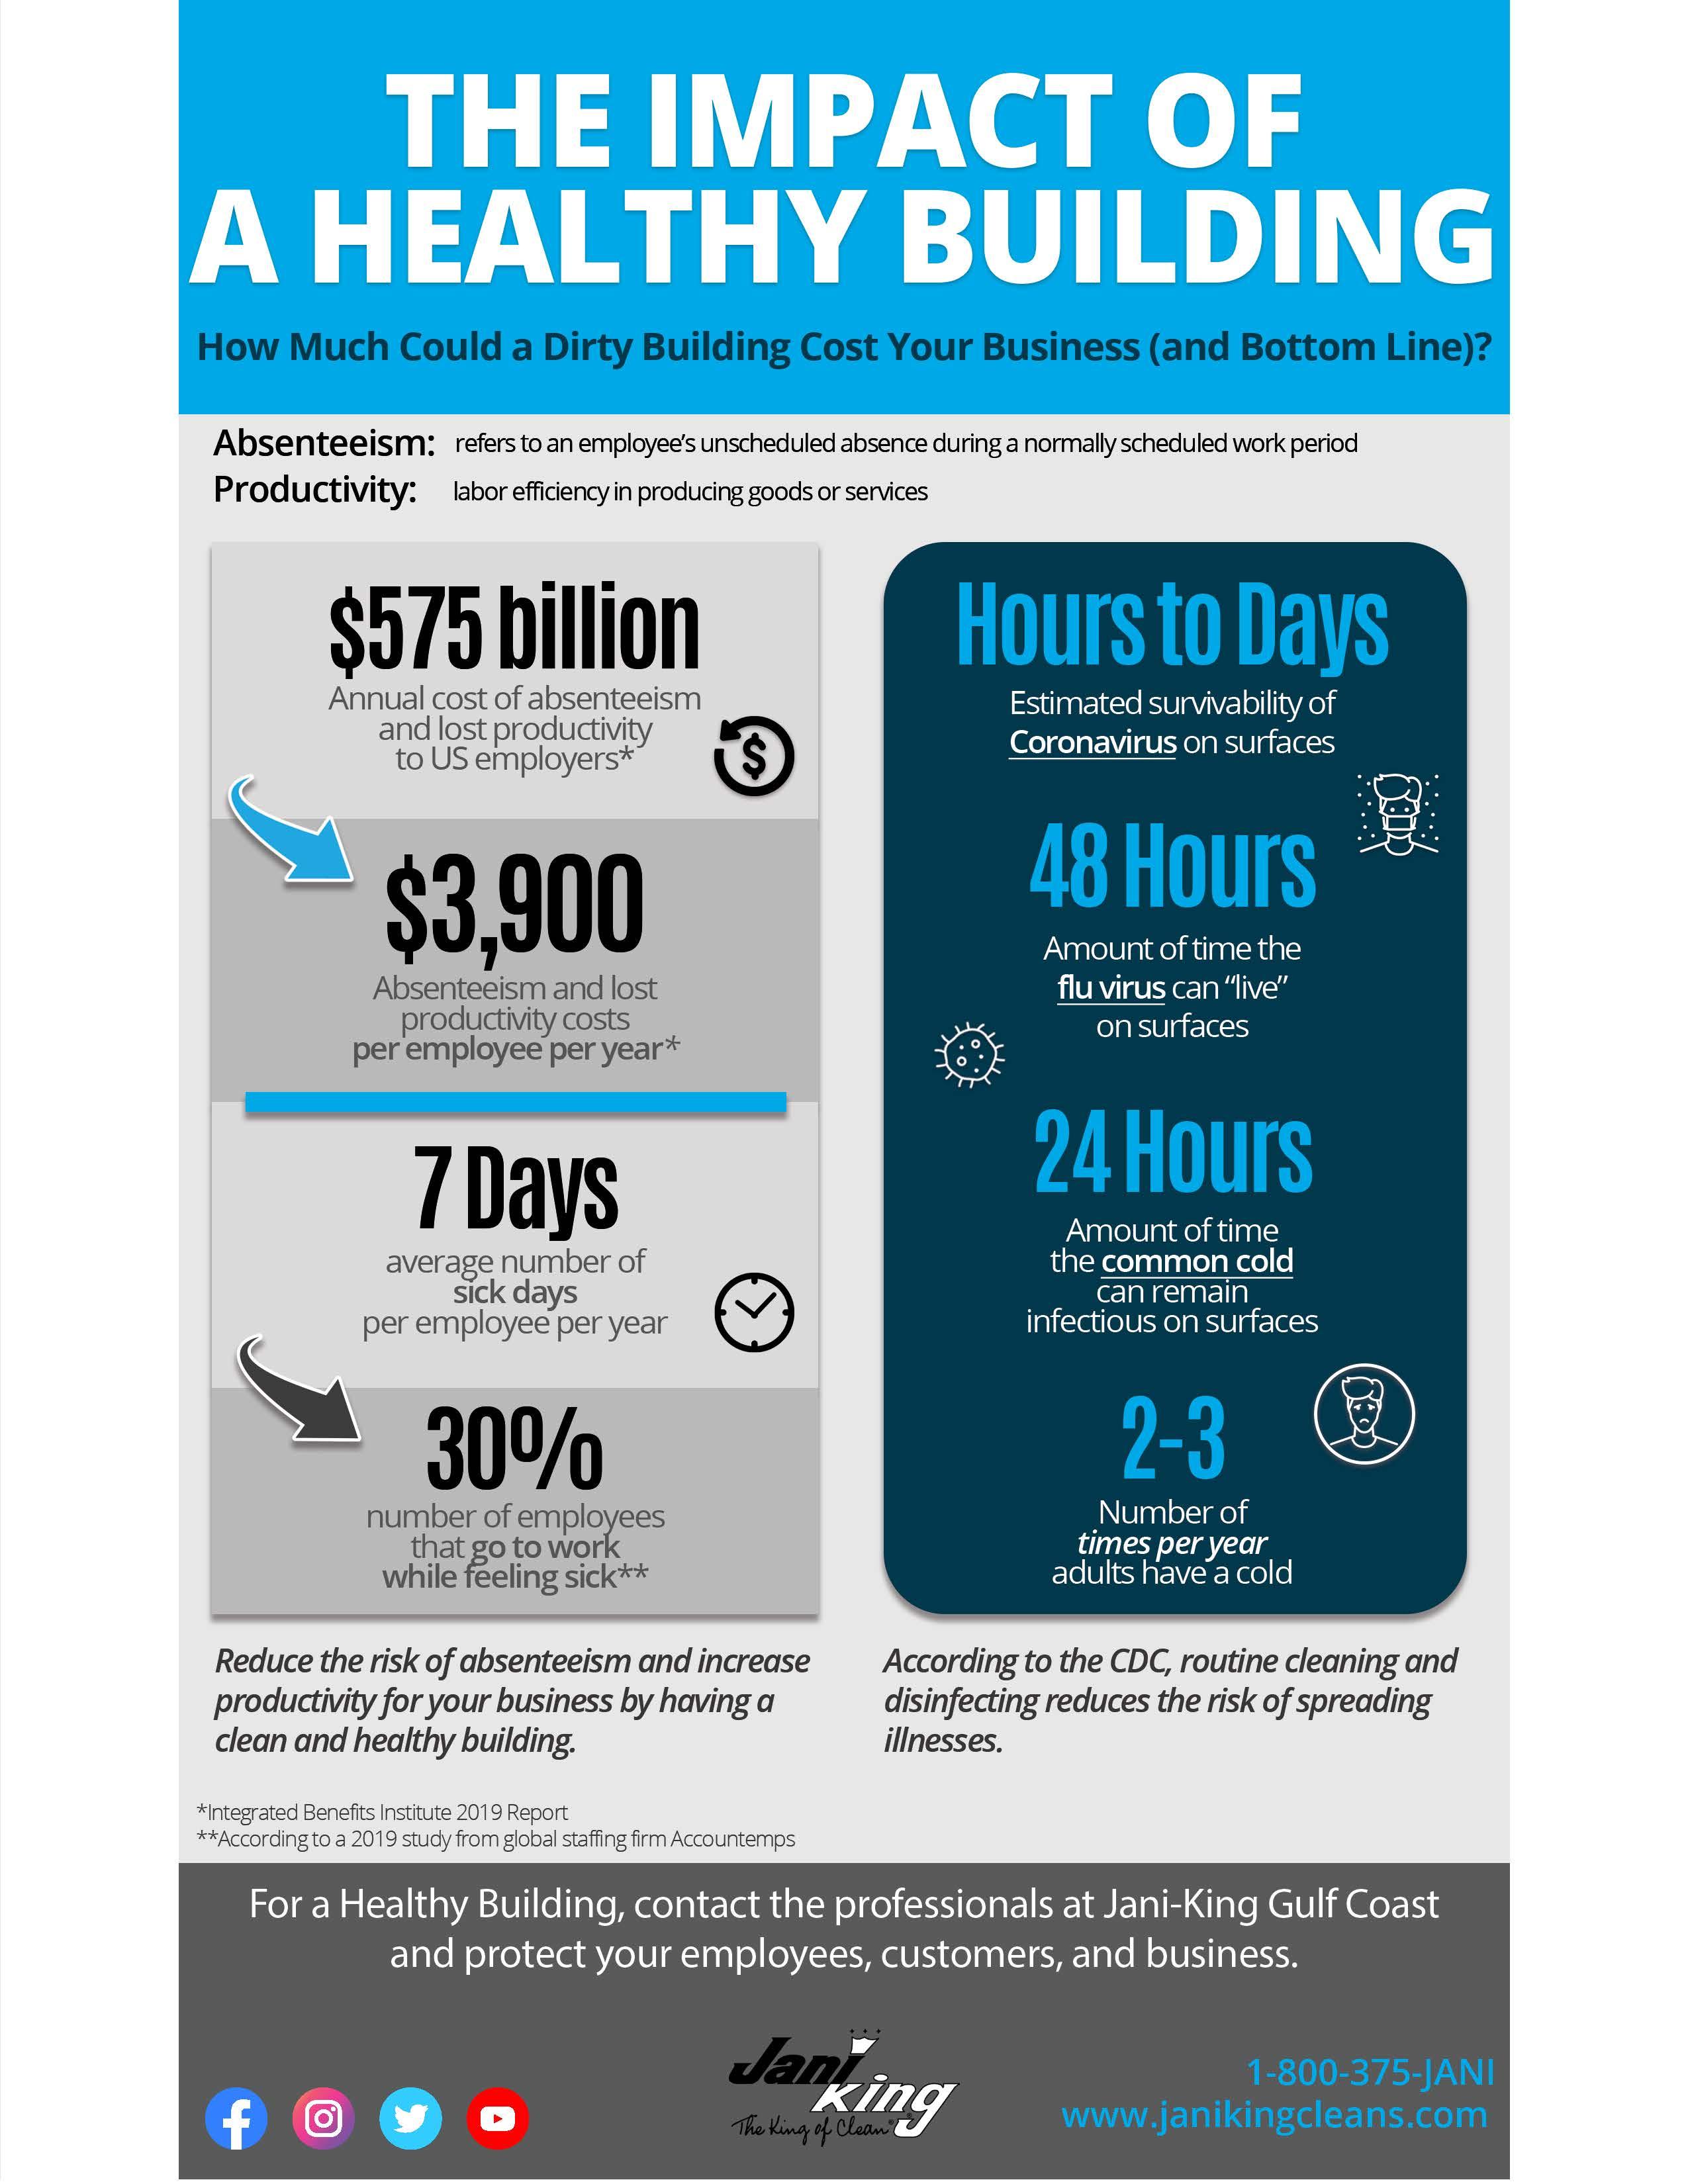 JKGCR-Healthy-Building-Infographic-1